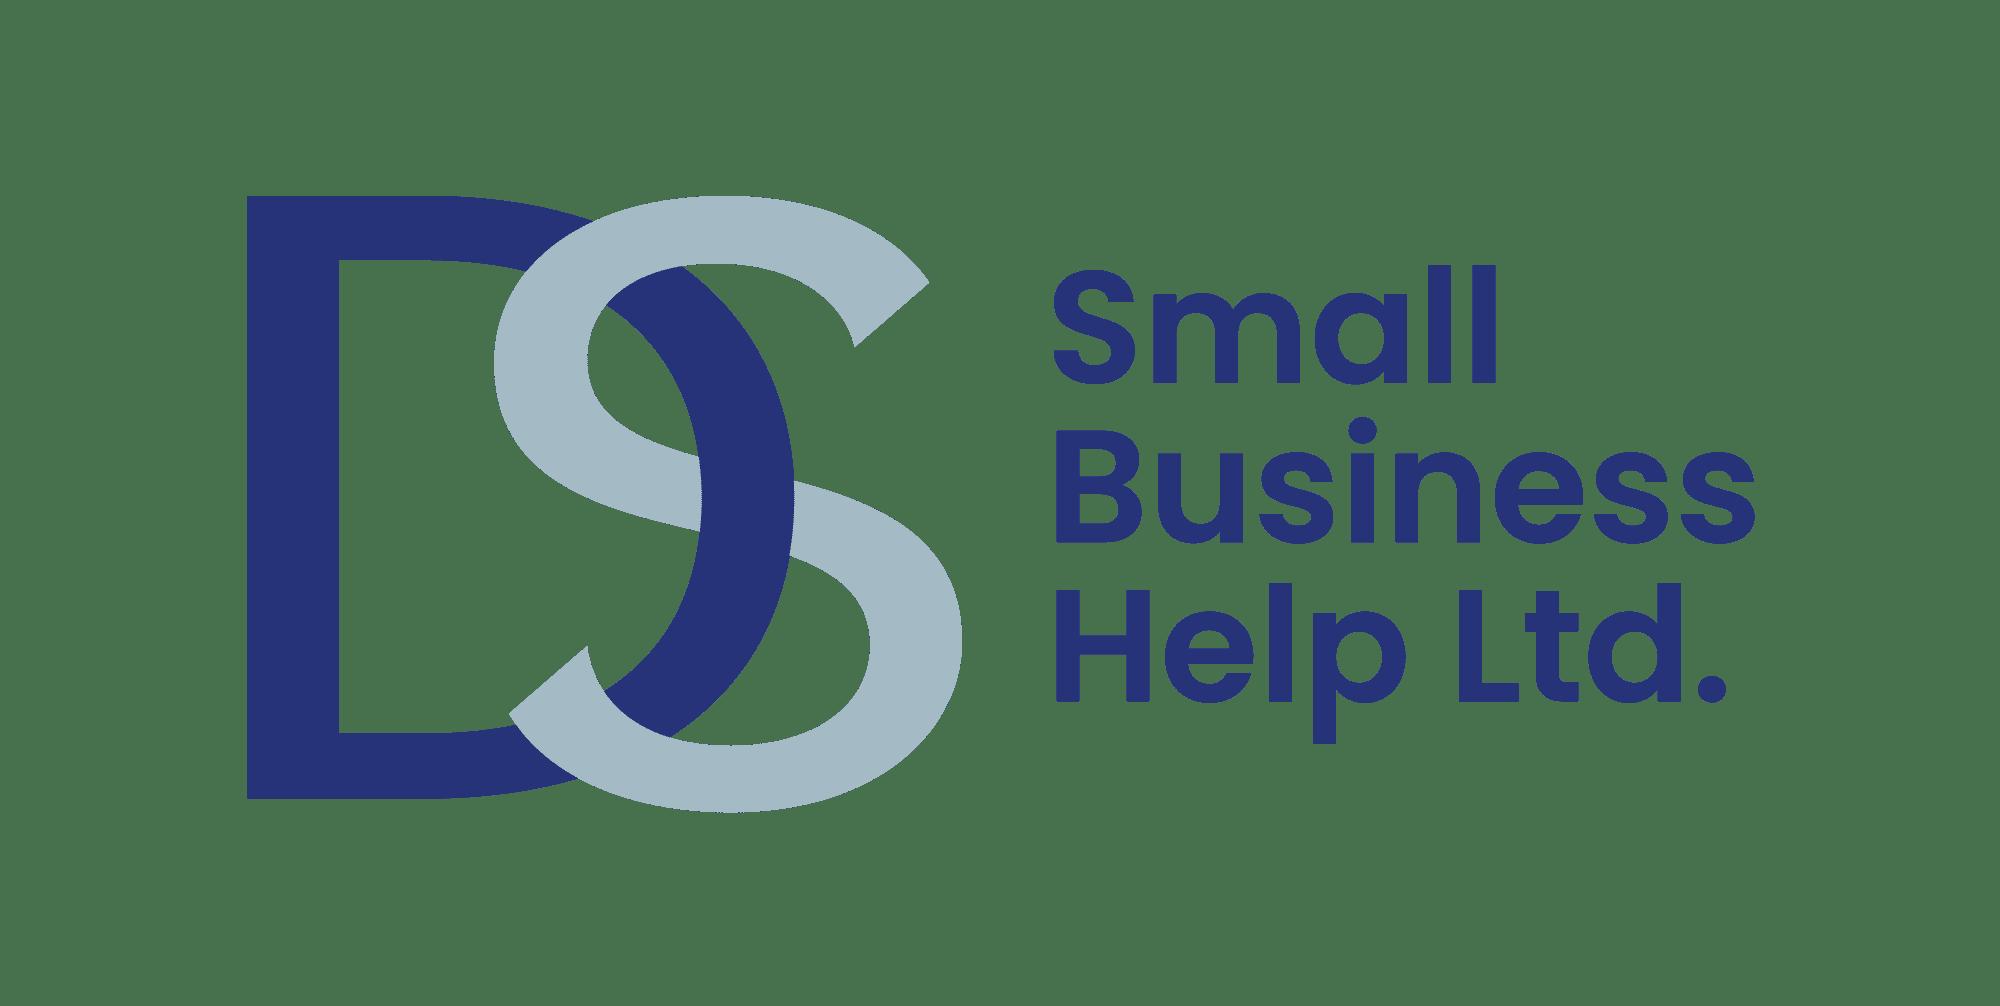 DS Small Business Help Ltd